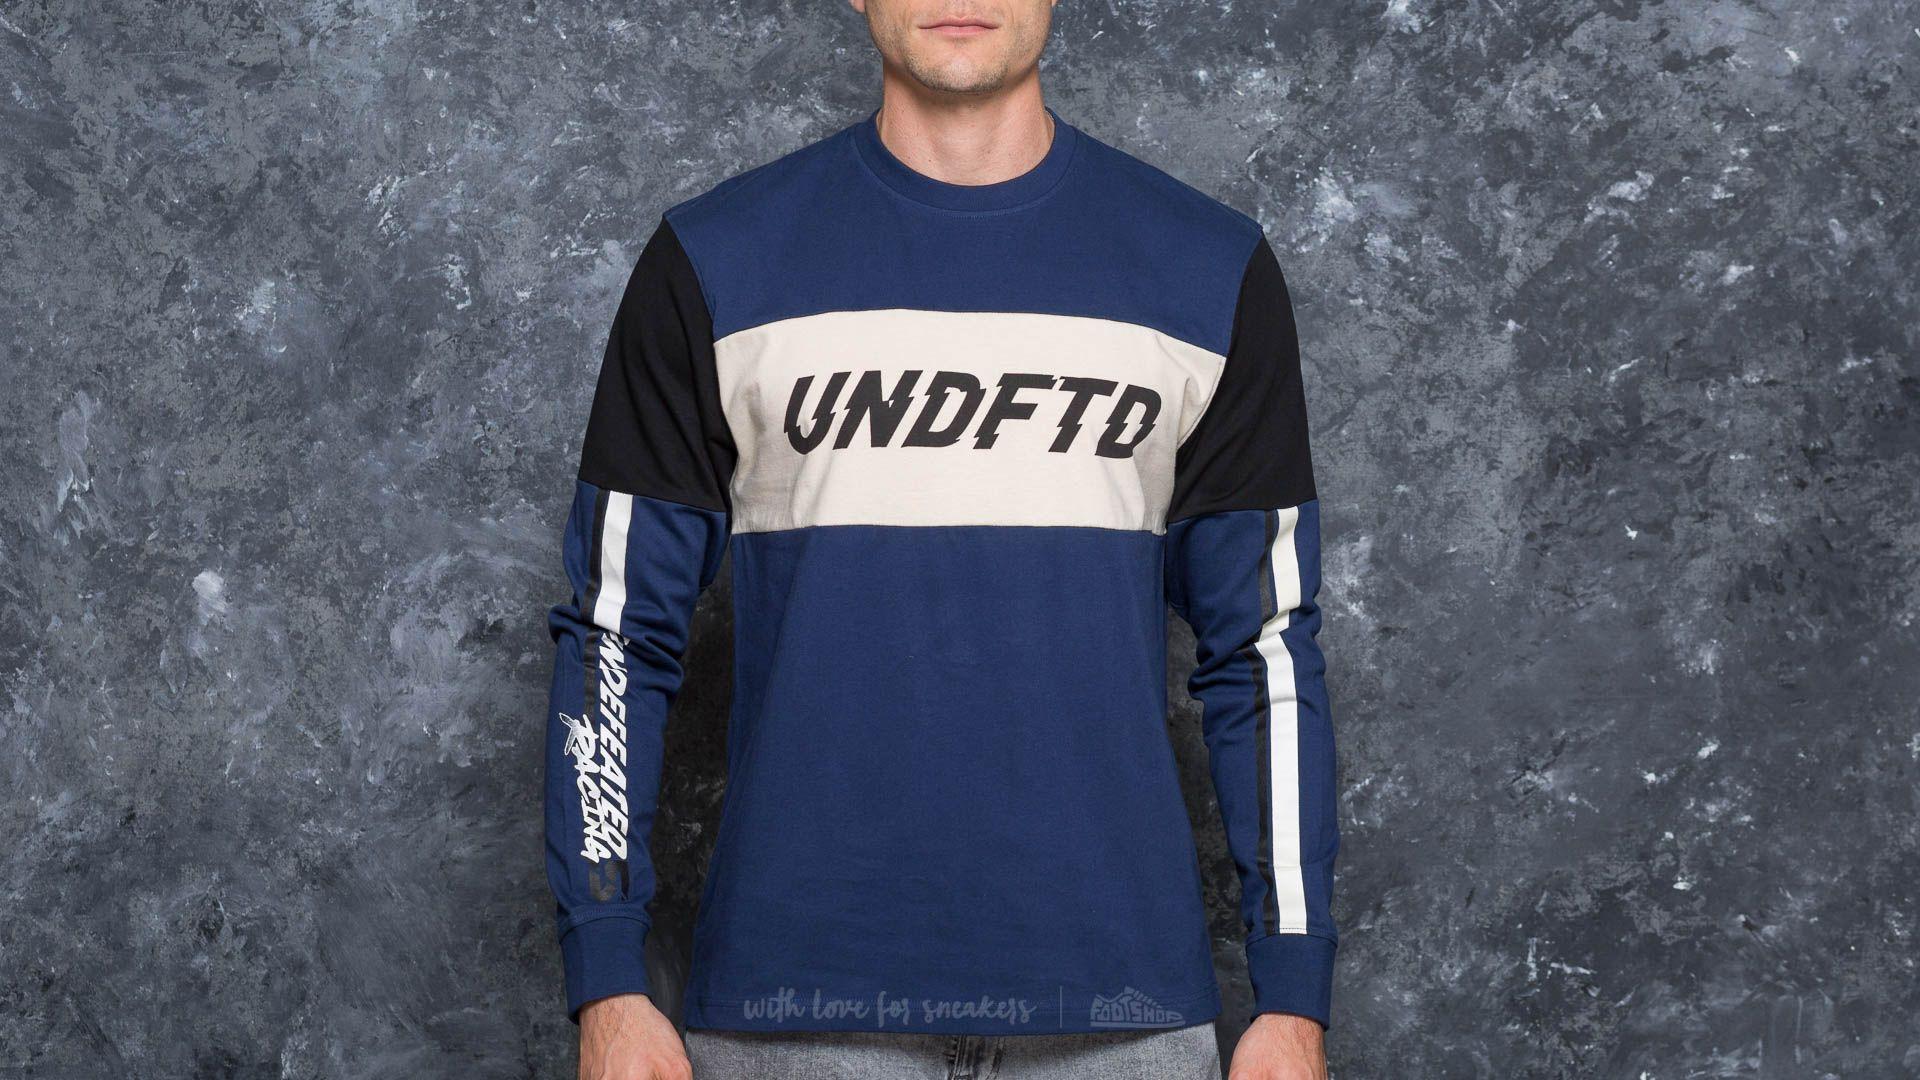 Undefeated Racer Longsleeve Jersey Blue